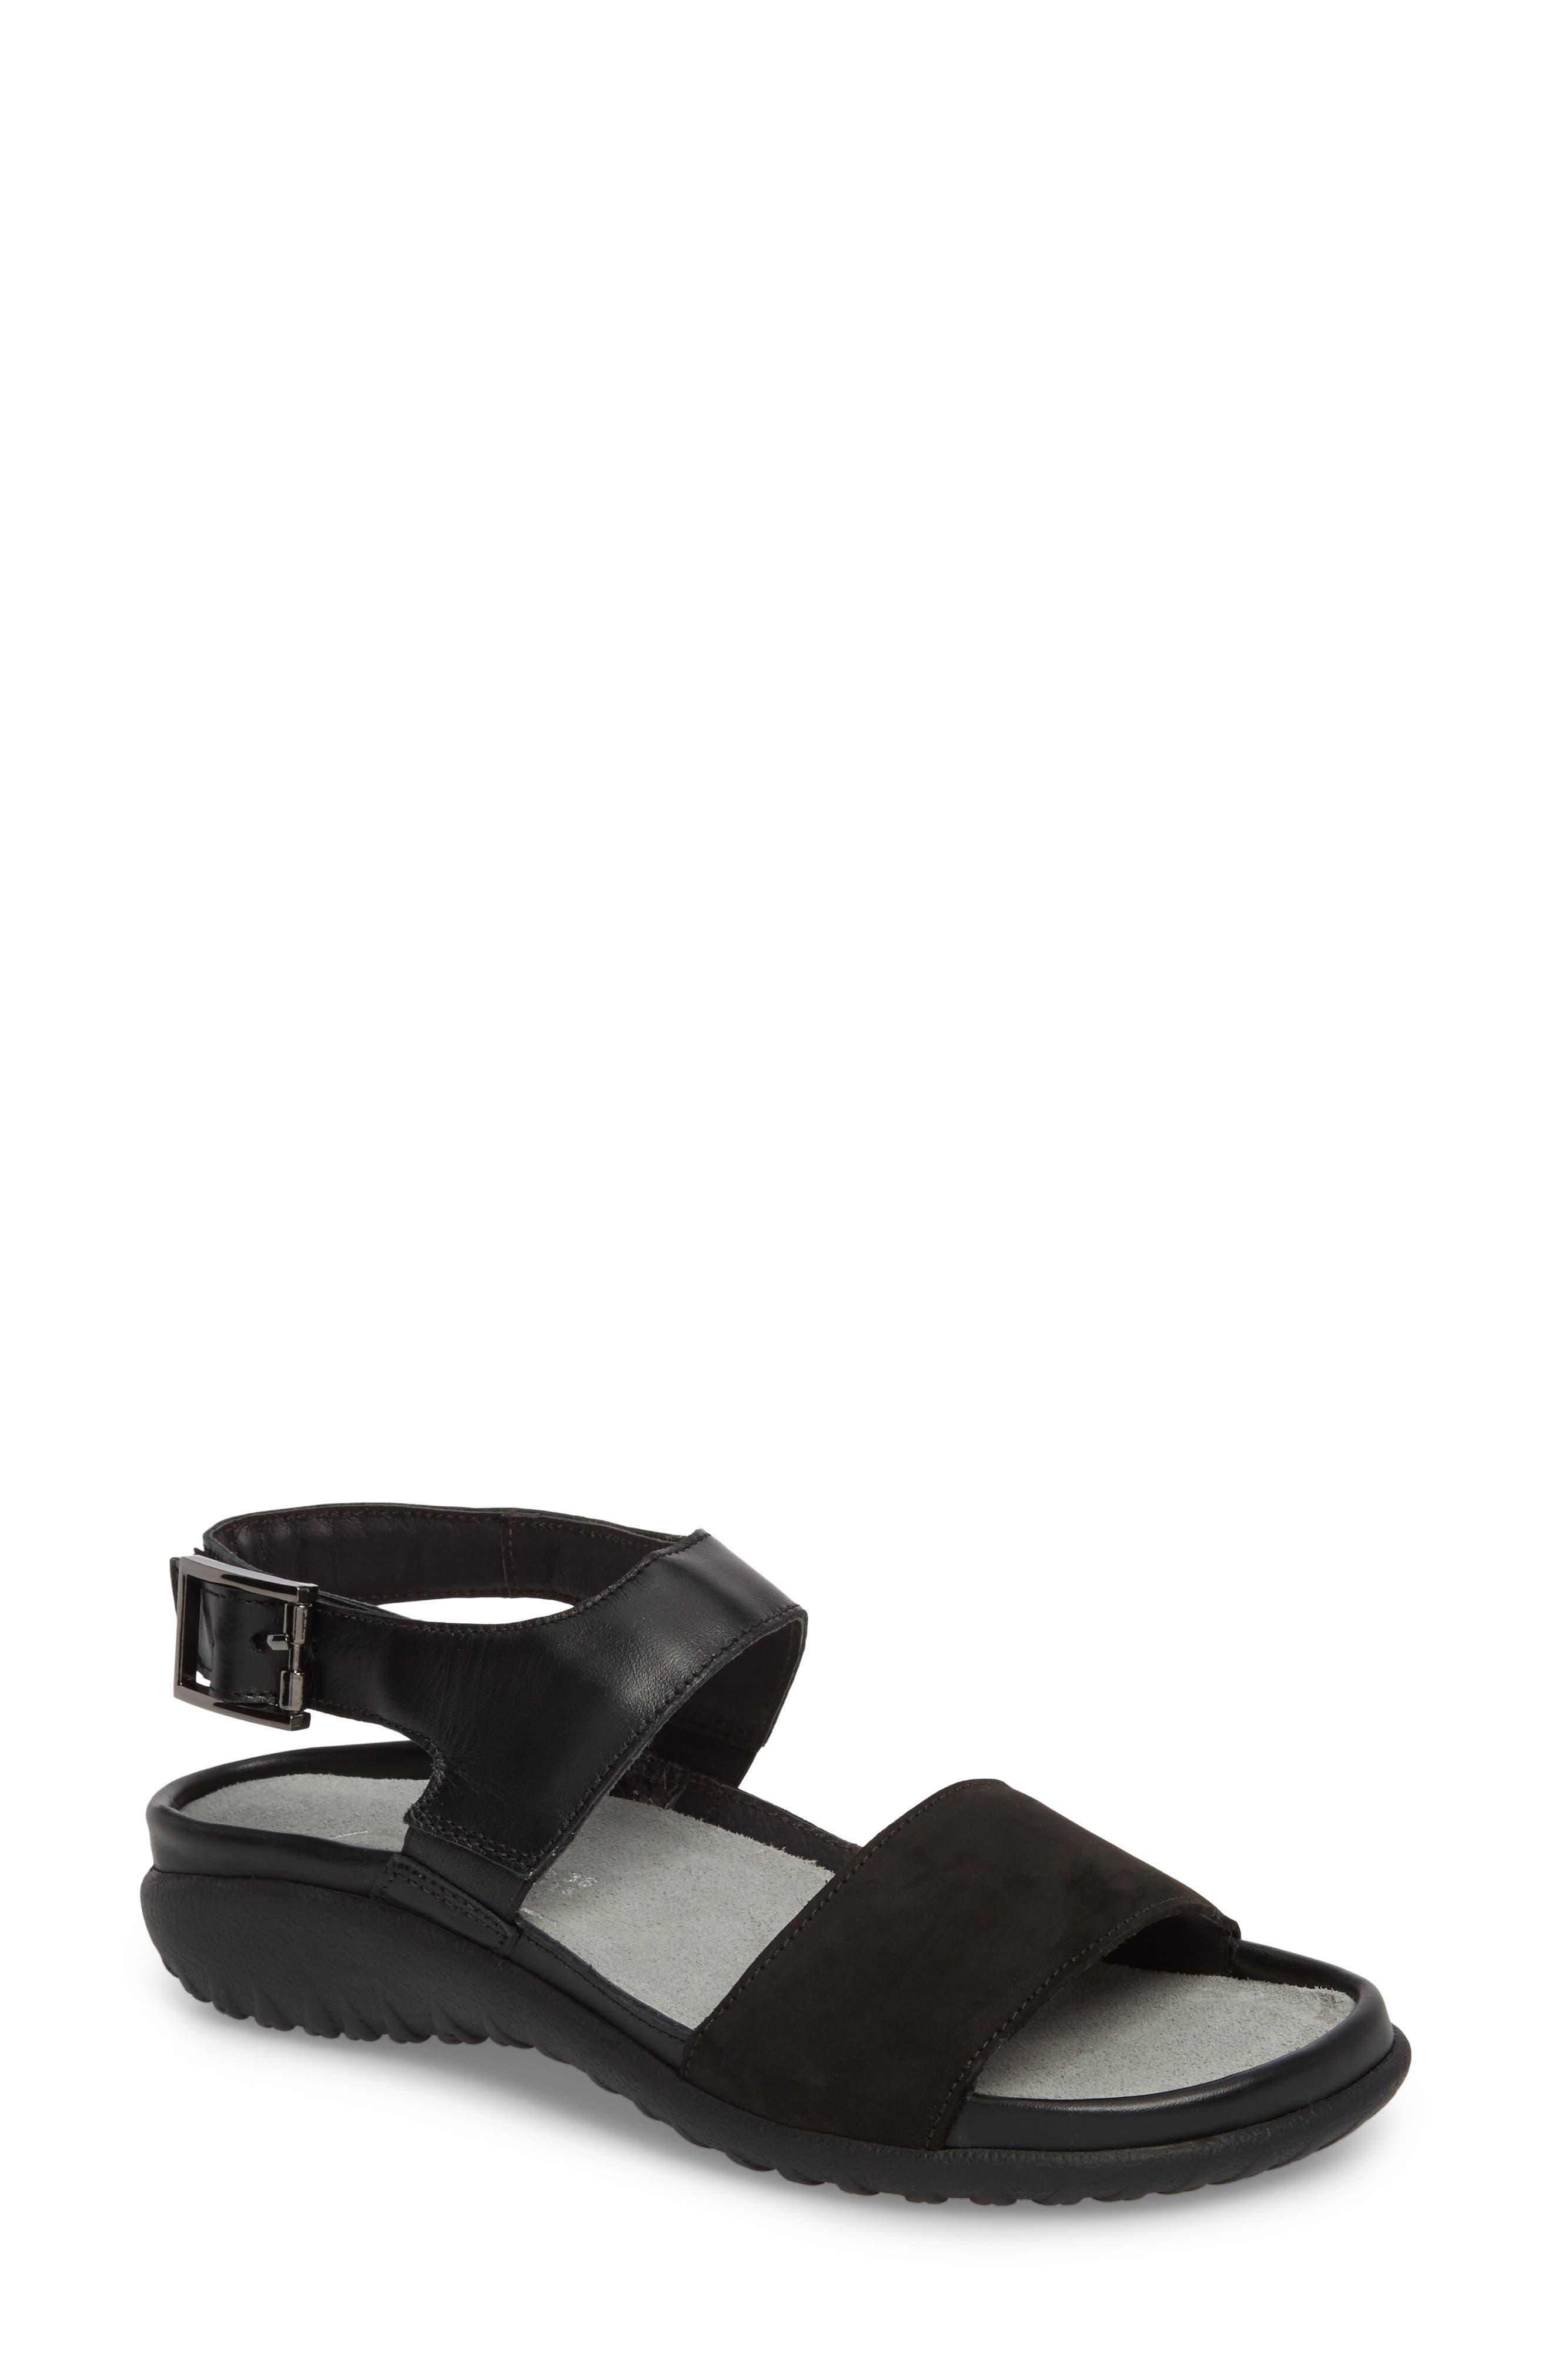 Haki Sandal,                         Main,                         color, BLACK LEATHER